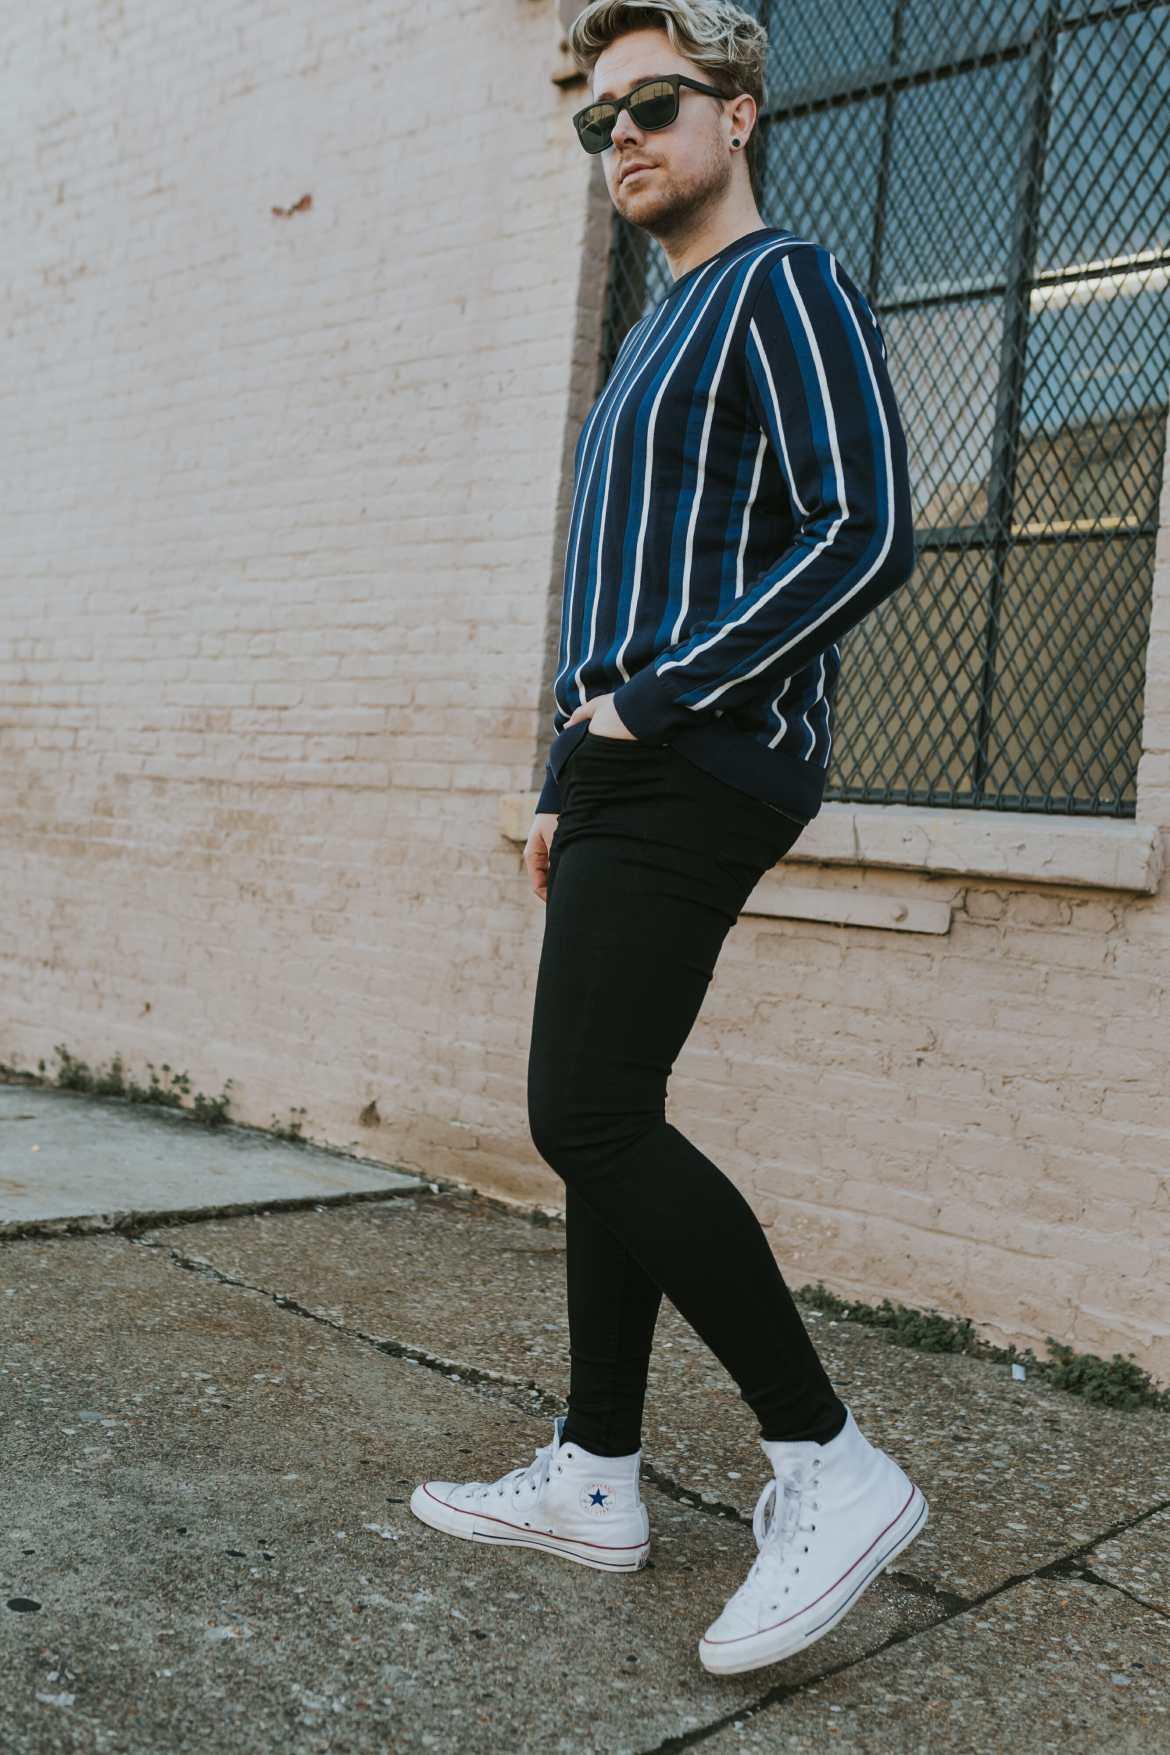 man in black jeans